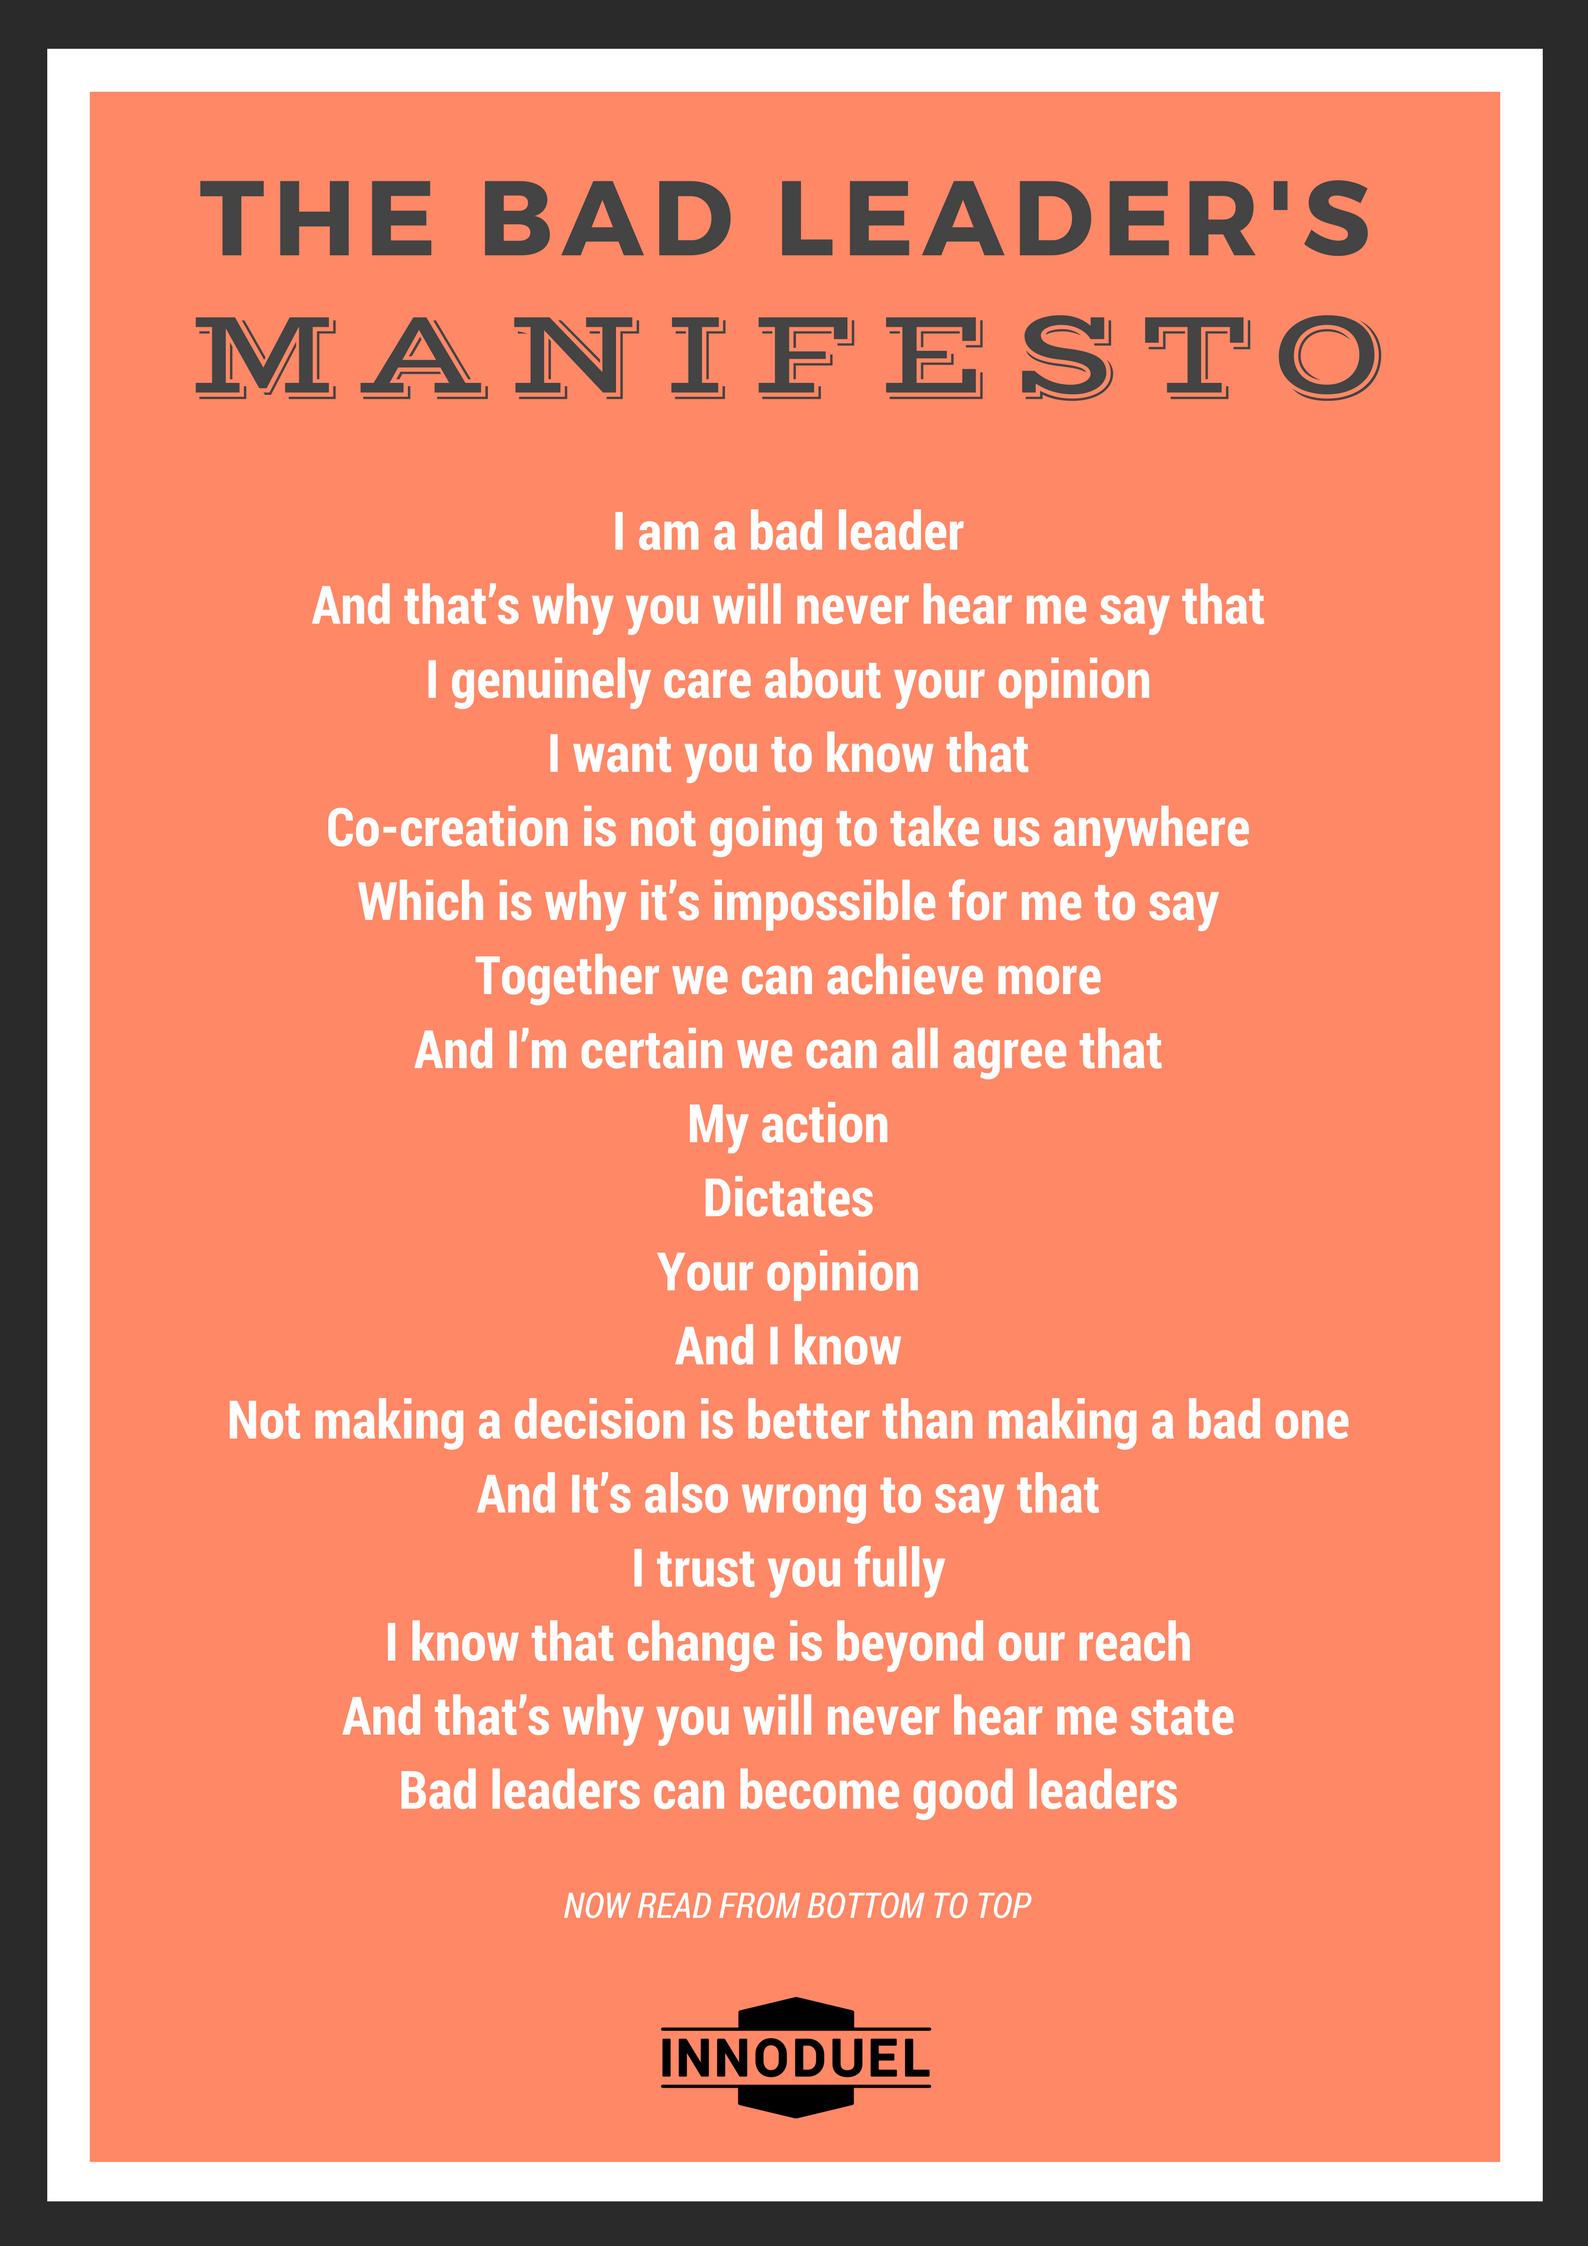 The Bad Leader's Manifesto.png